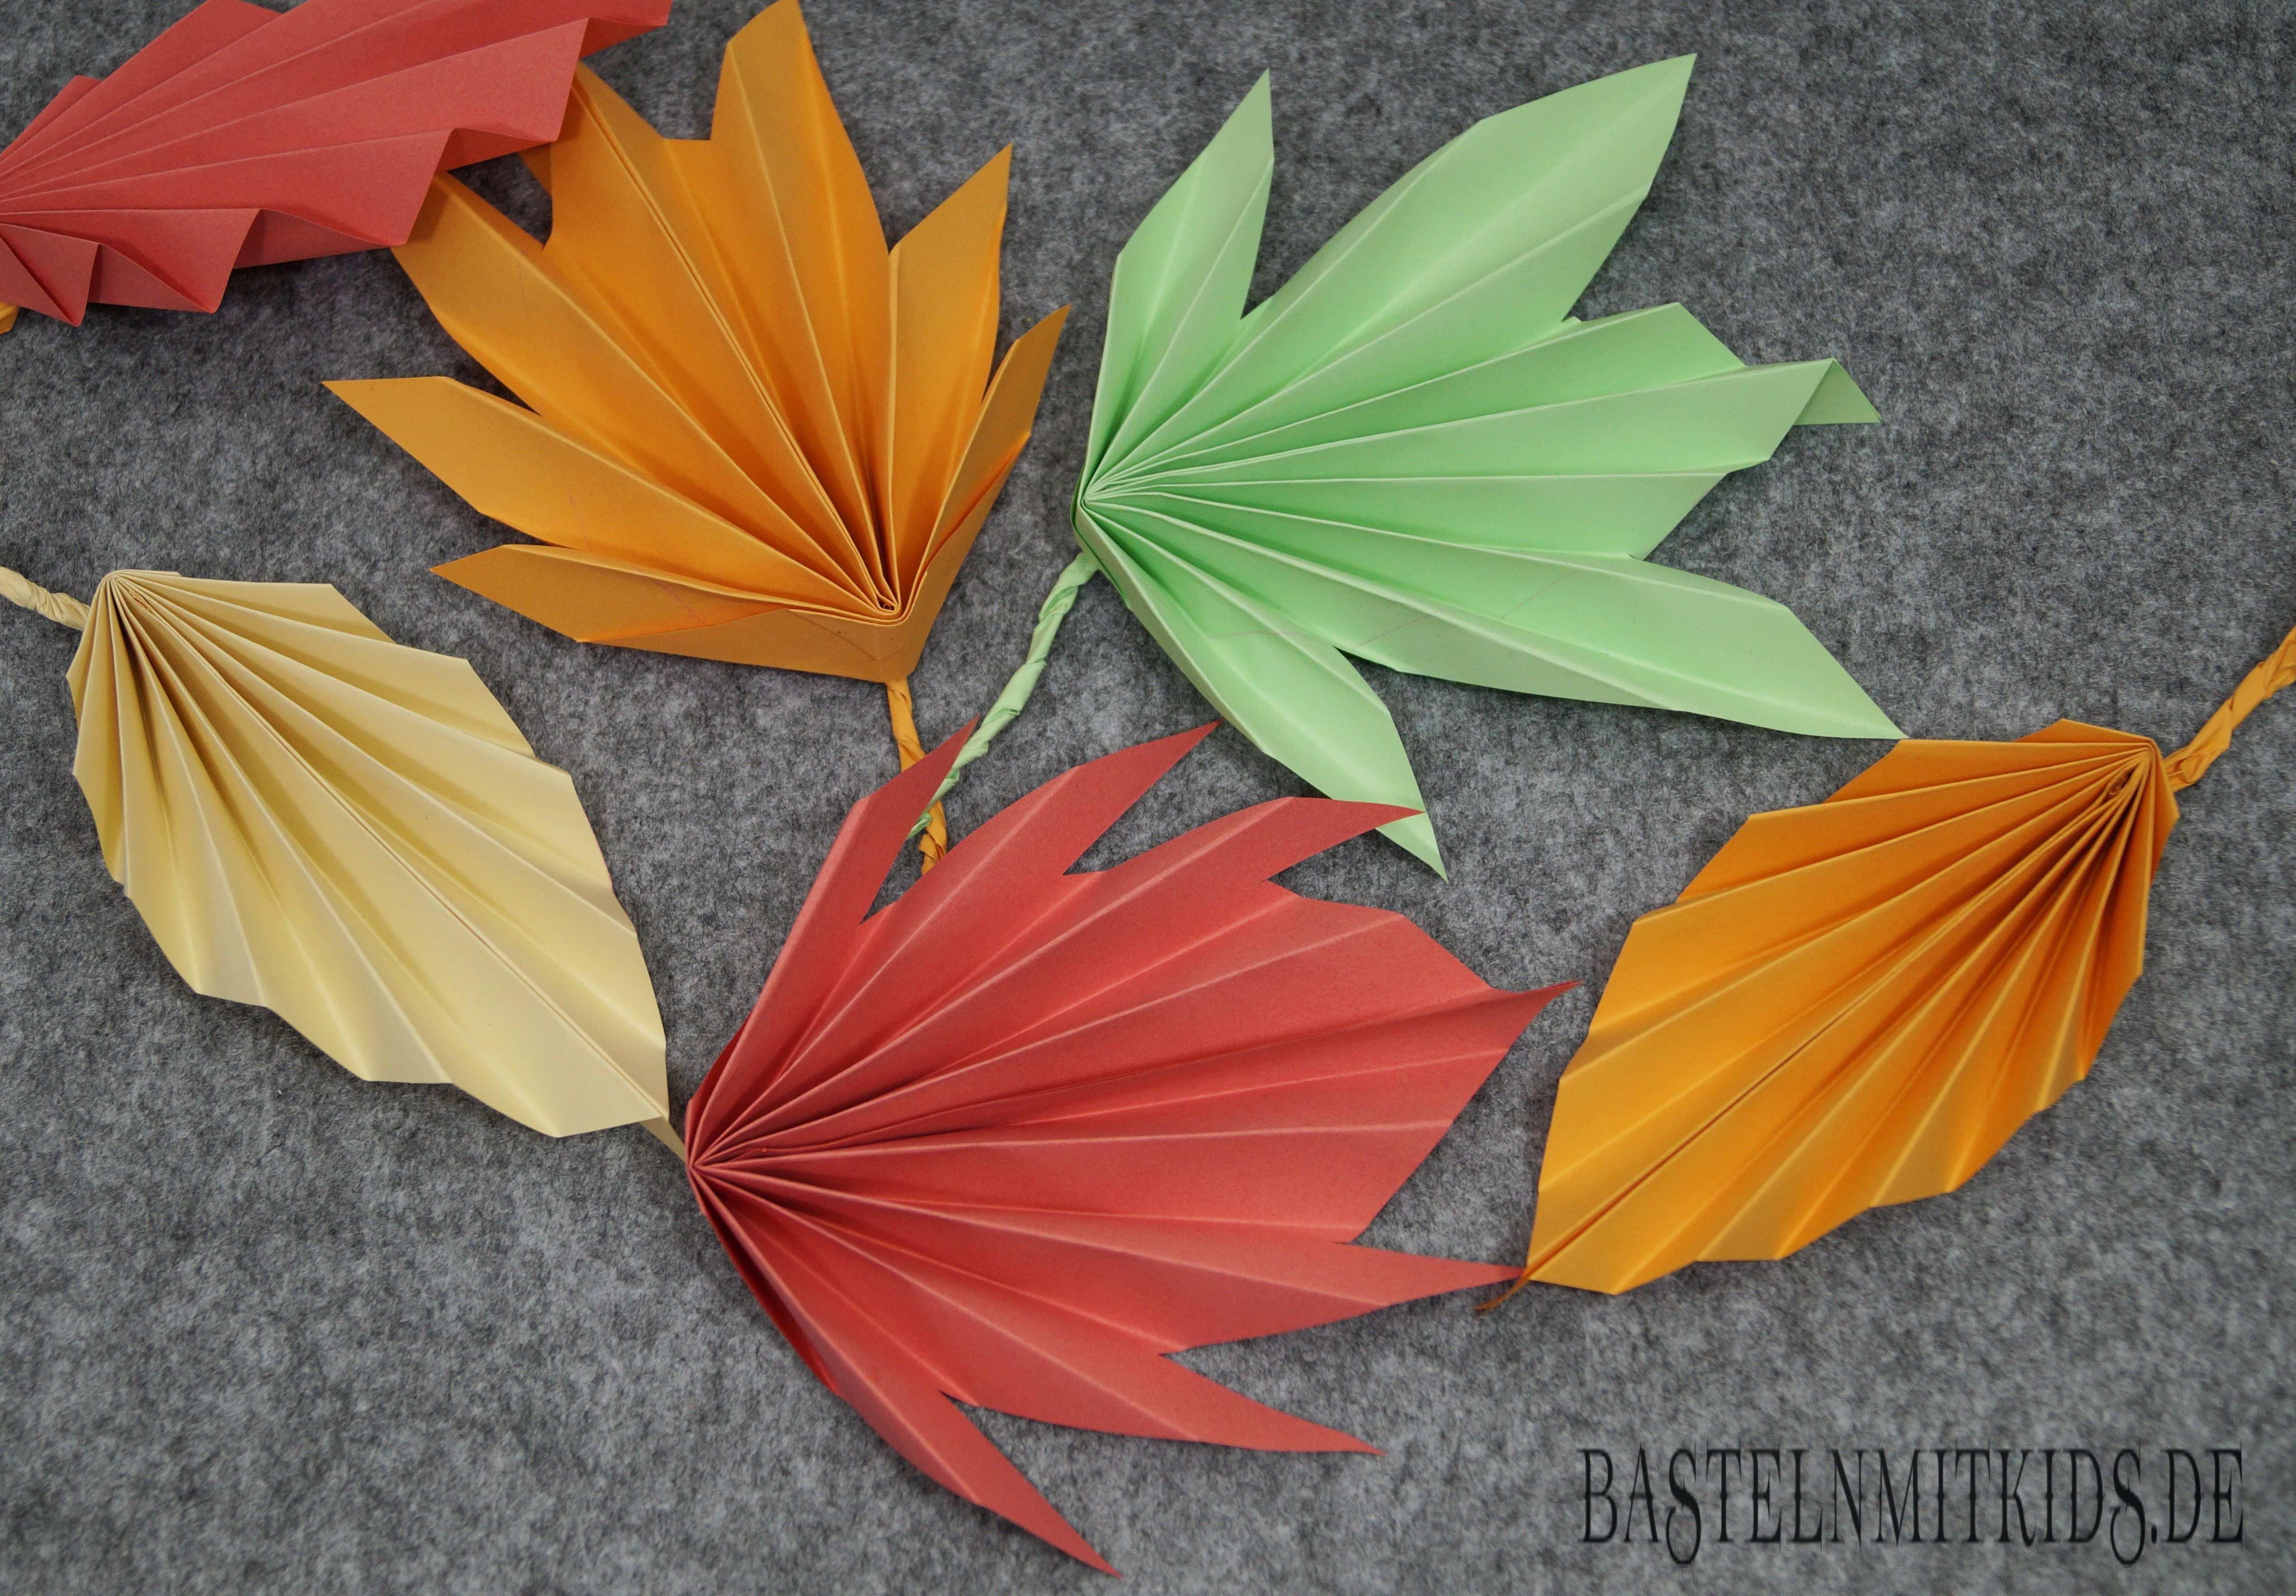 Papier Falten Fur Bunte Herbstblatter Basteln Mit Kindern Basteln Herbst Papier Falten Herbstlaub